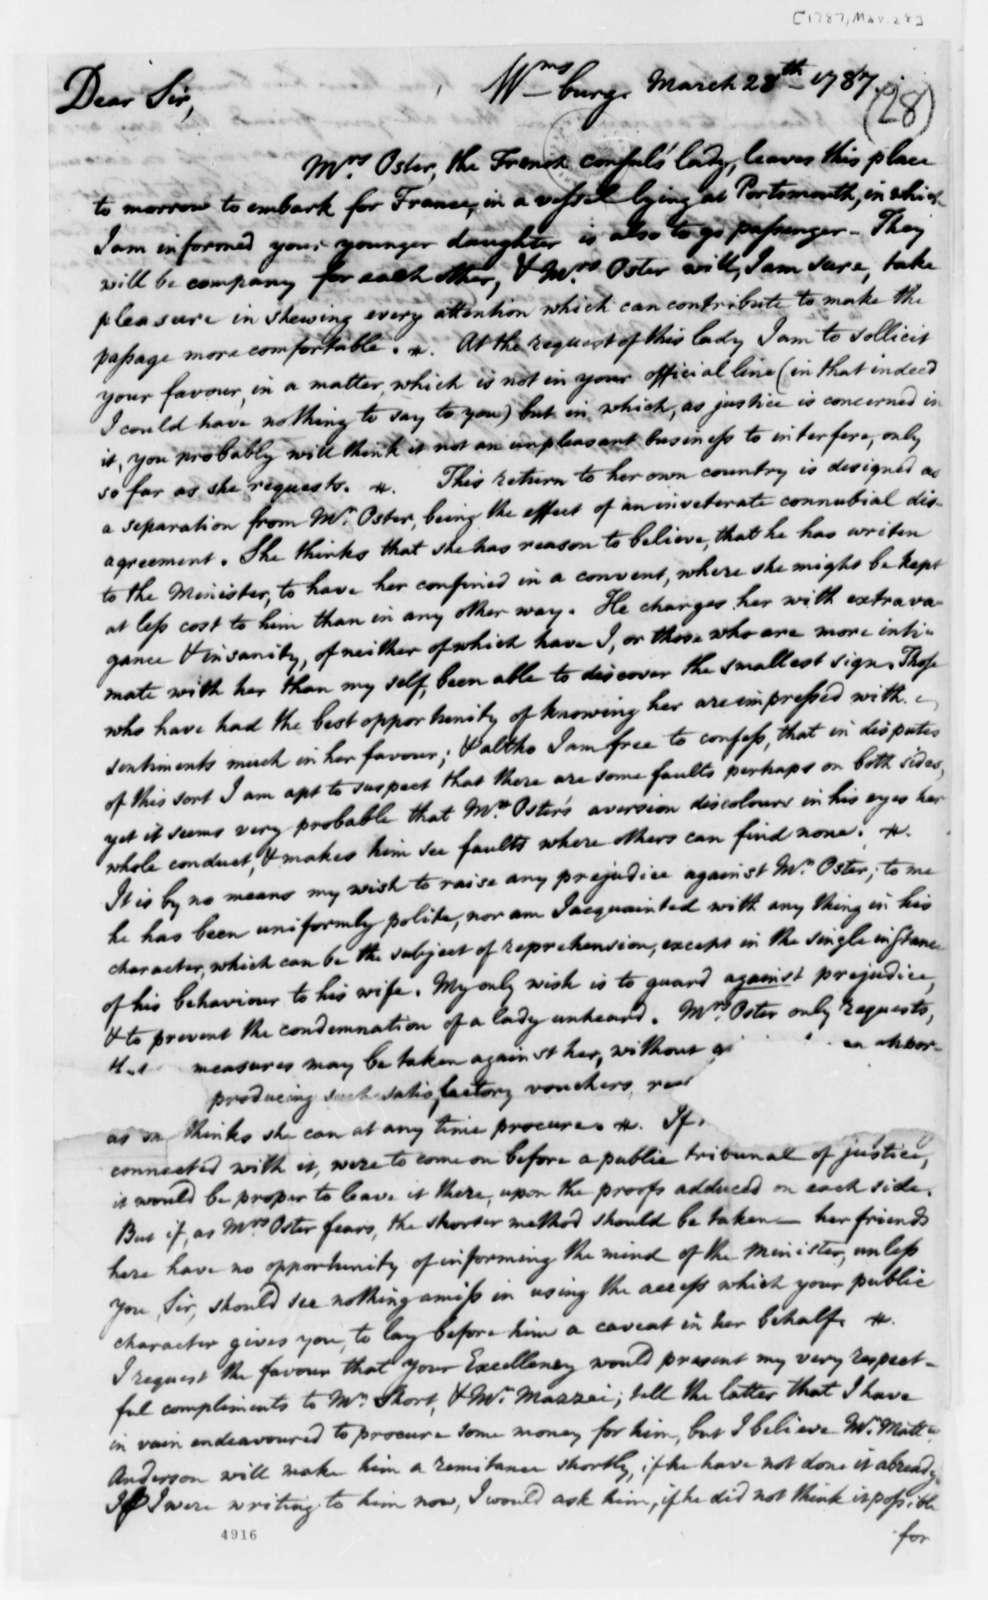 John Blair to Thomas Jefferson, March 28, 1787